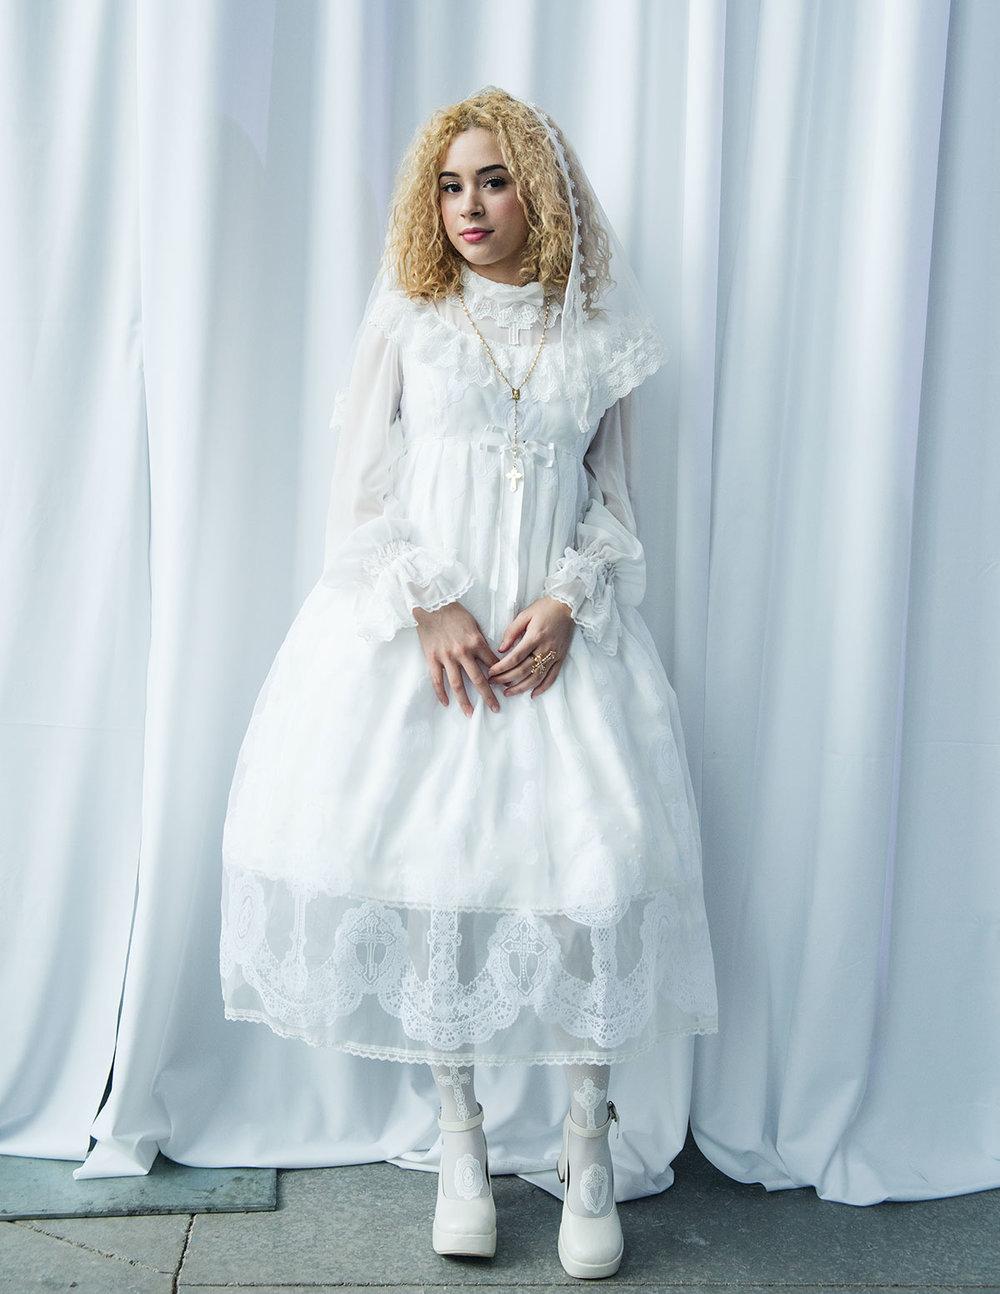 AMP_SewnSeeds_Lolita_11.jpg